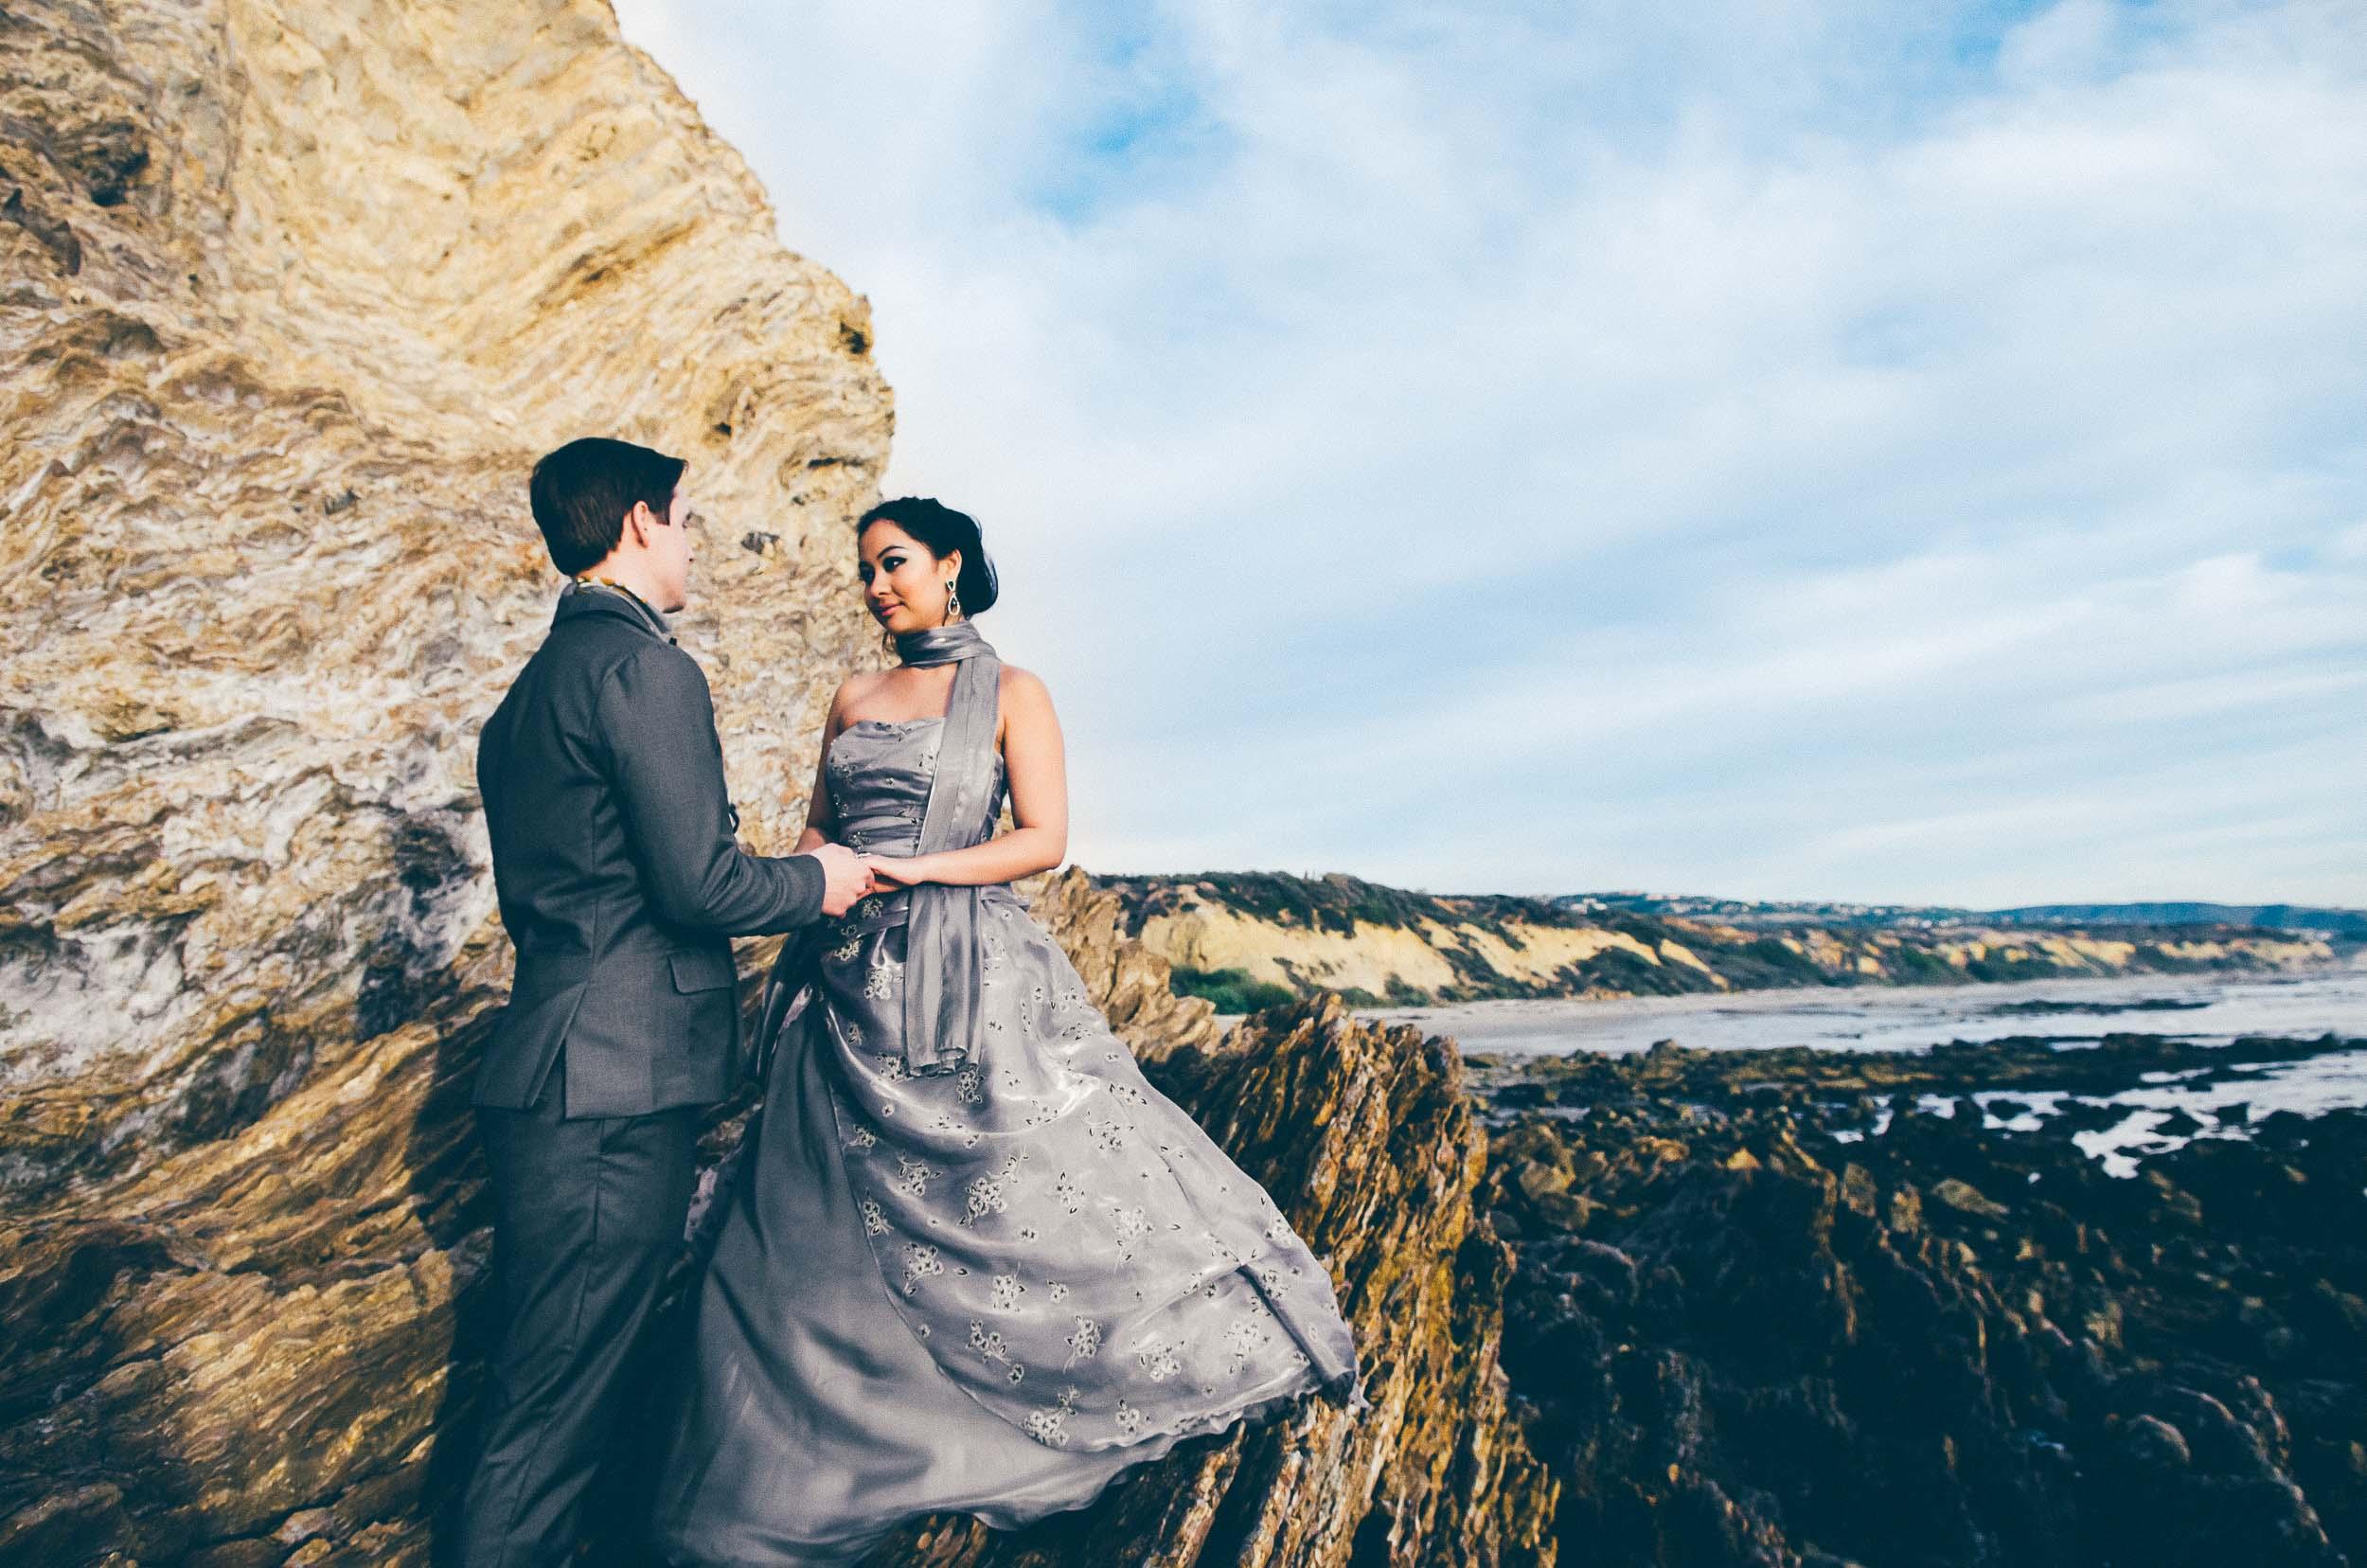 Bryan-Miraflor-Photography-Jackie-Ryan-Beach-Couple-Photoshoot-20131215-0043-1.jpg